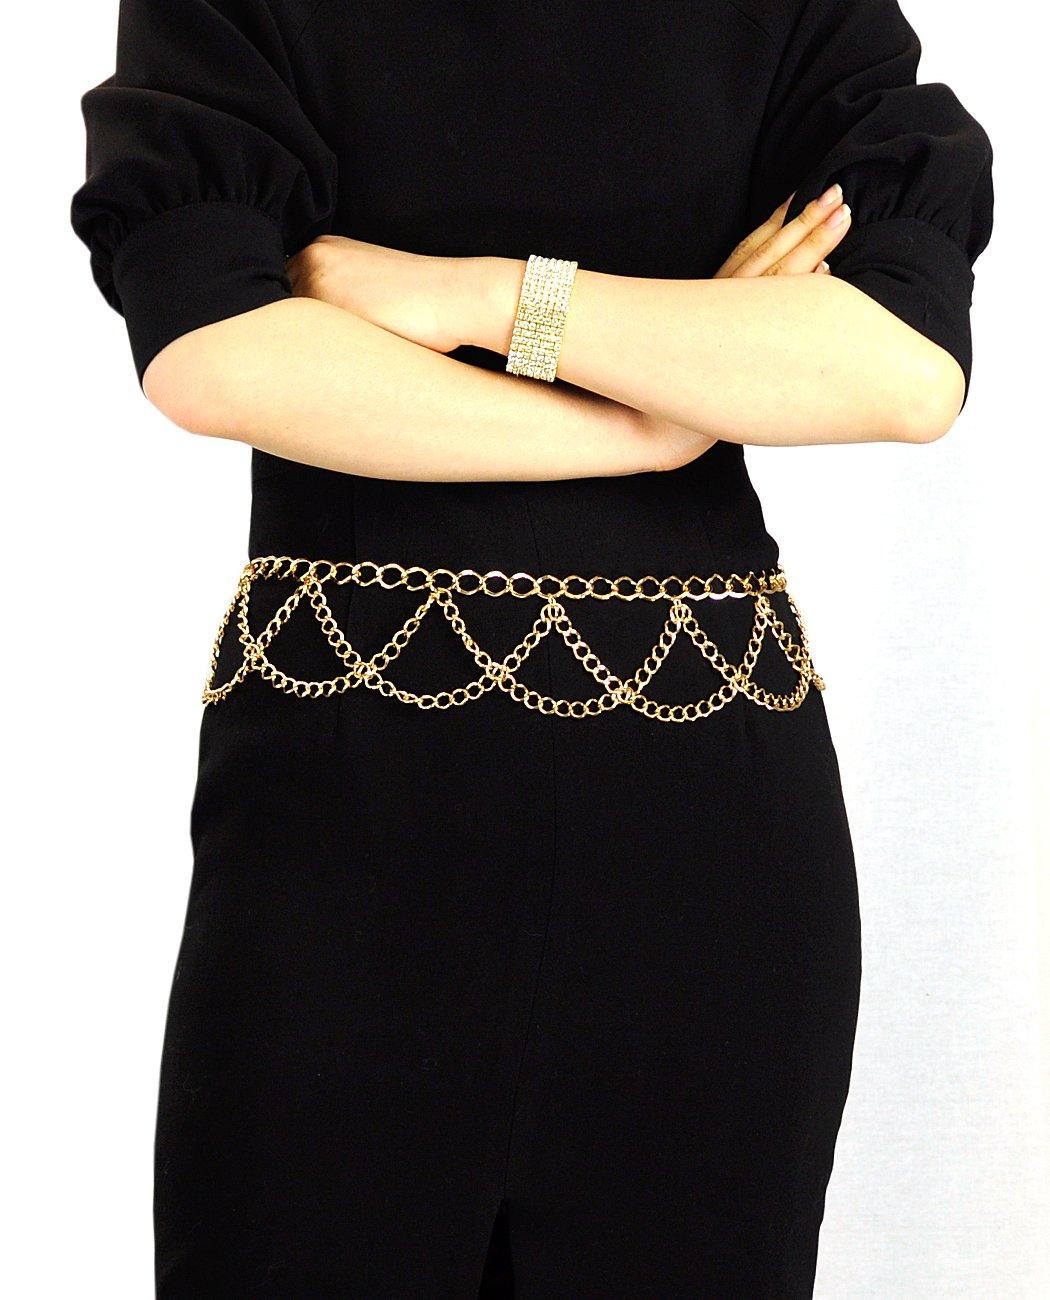 NYfashion101 Trendy Belly Chain Belt w/ Multi Link Chains IBT1002-Gold